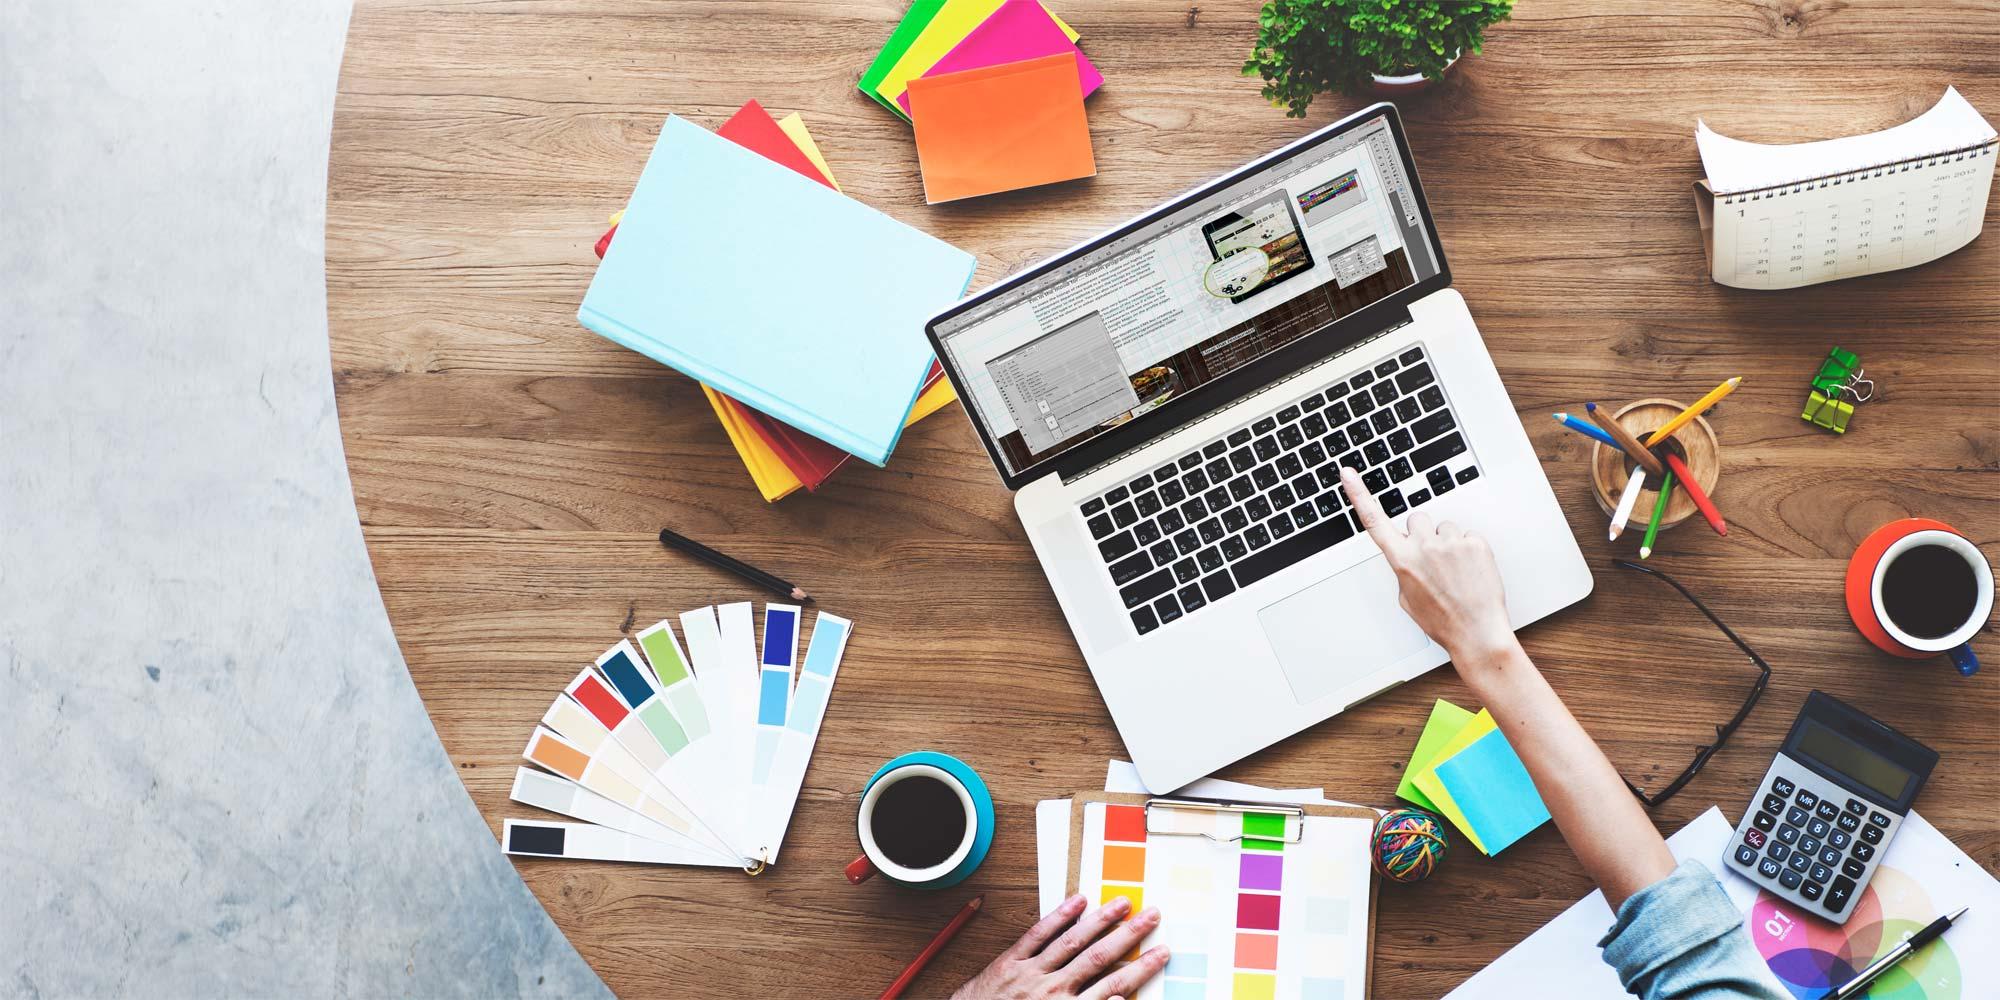 Apa itu Web Design?